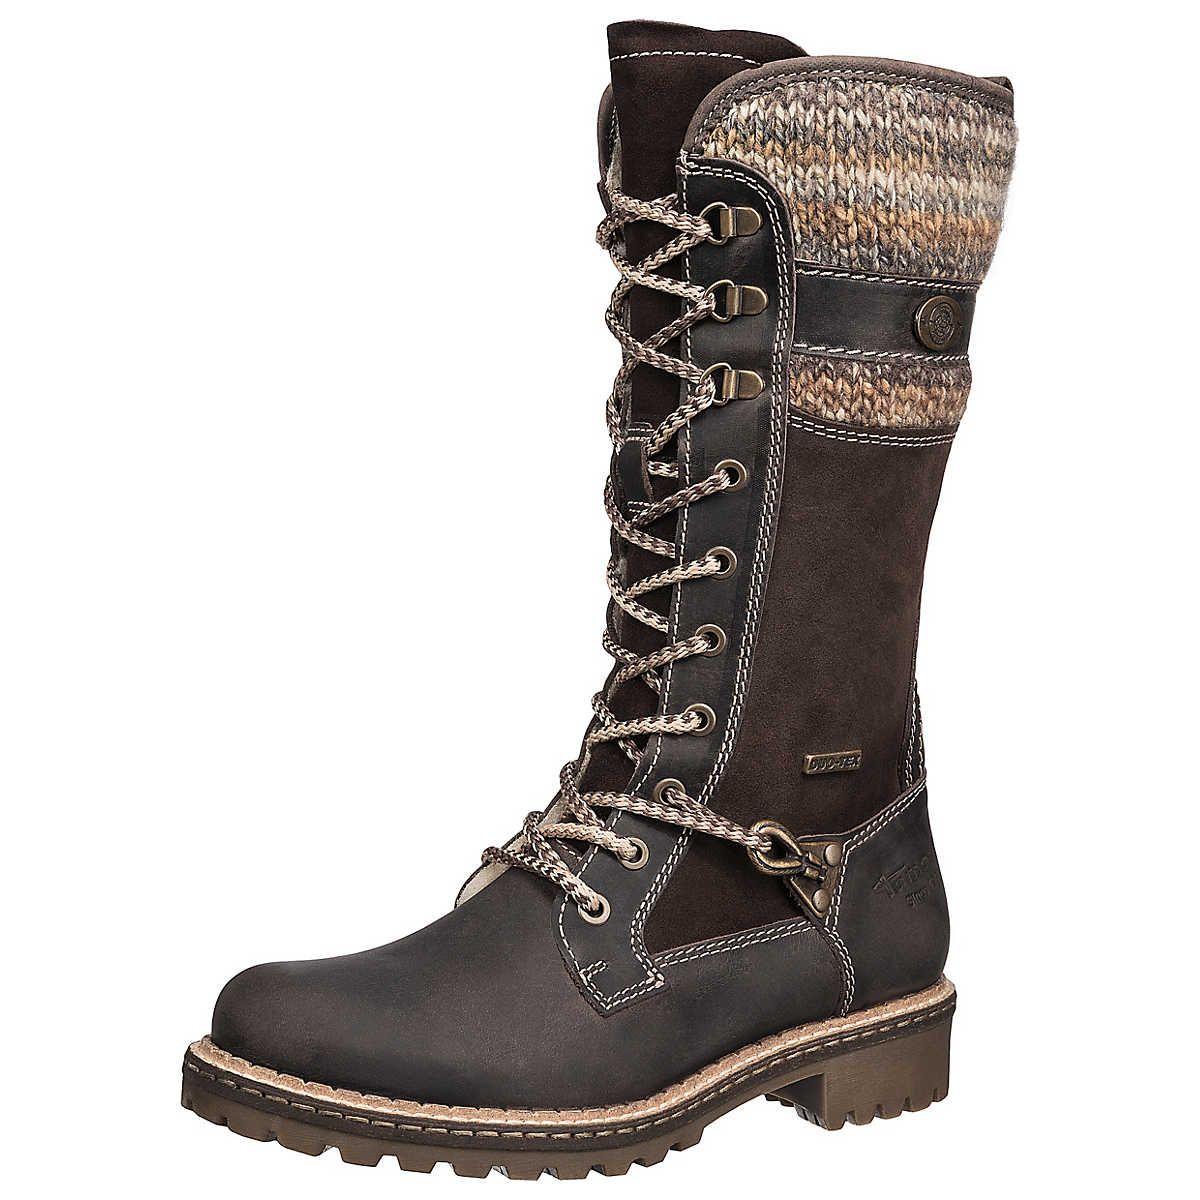 Tamaris Stiefel #winter #cold #boots #tamaris | Herbst